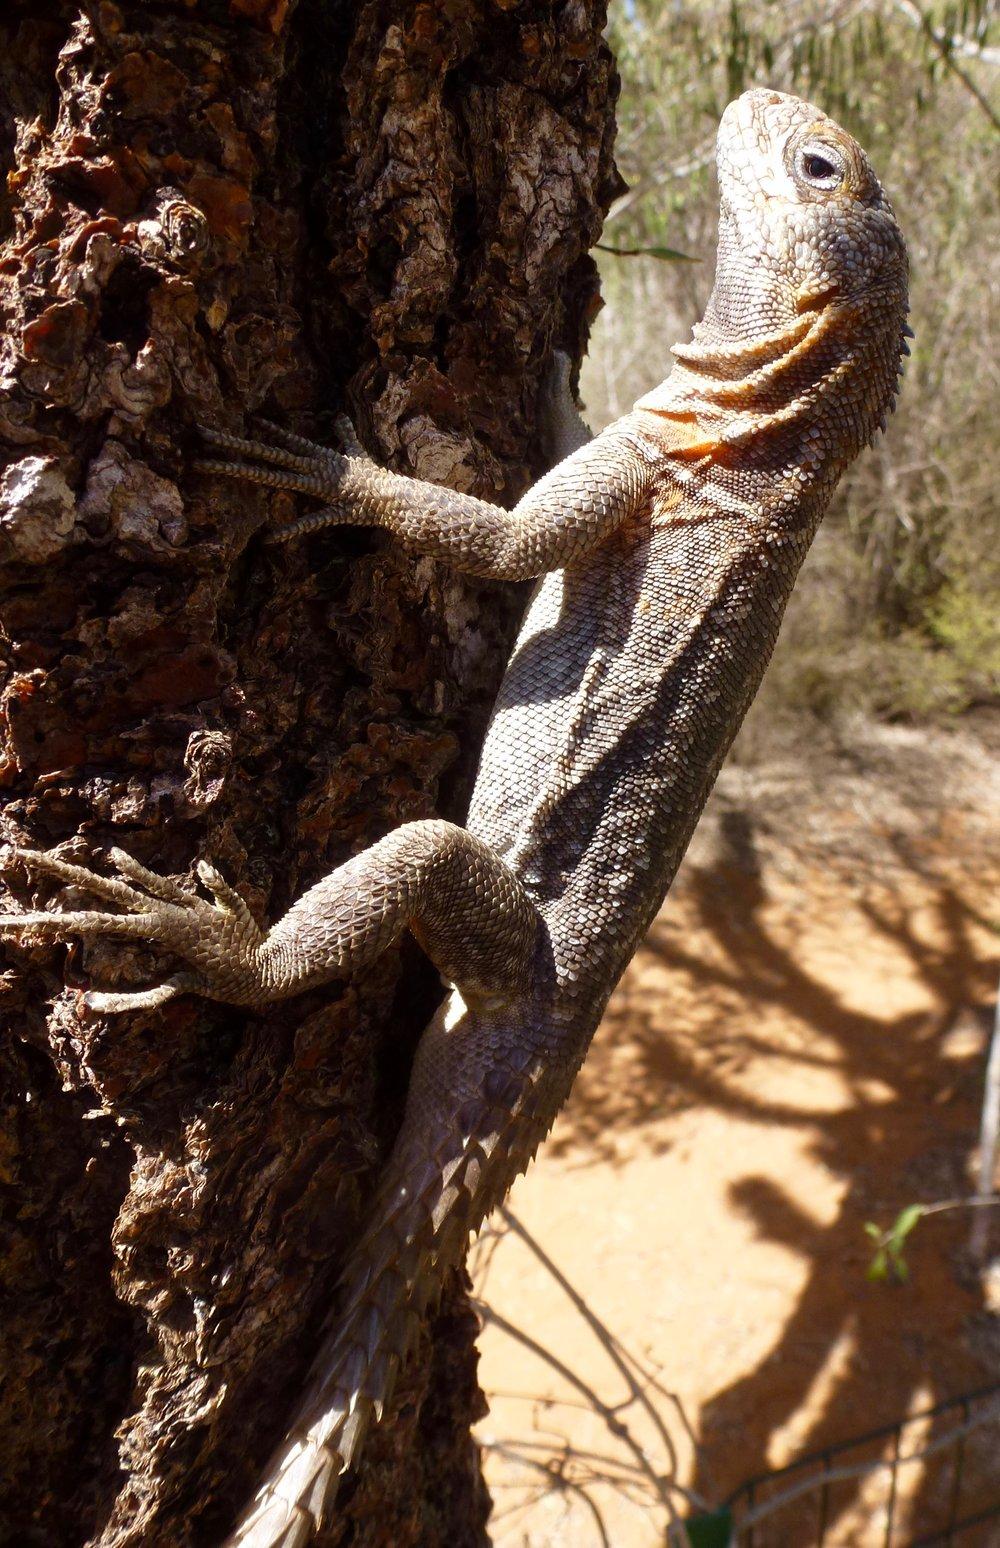 Spiny tail iguana, Oplurus cyclurus.